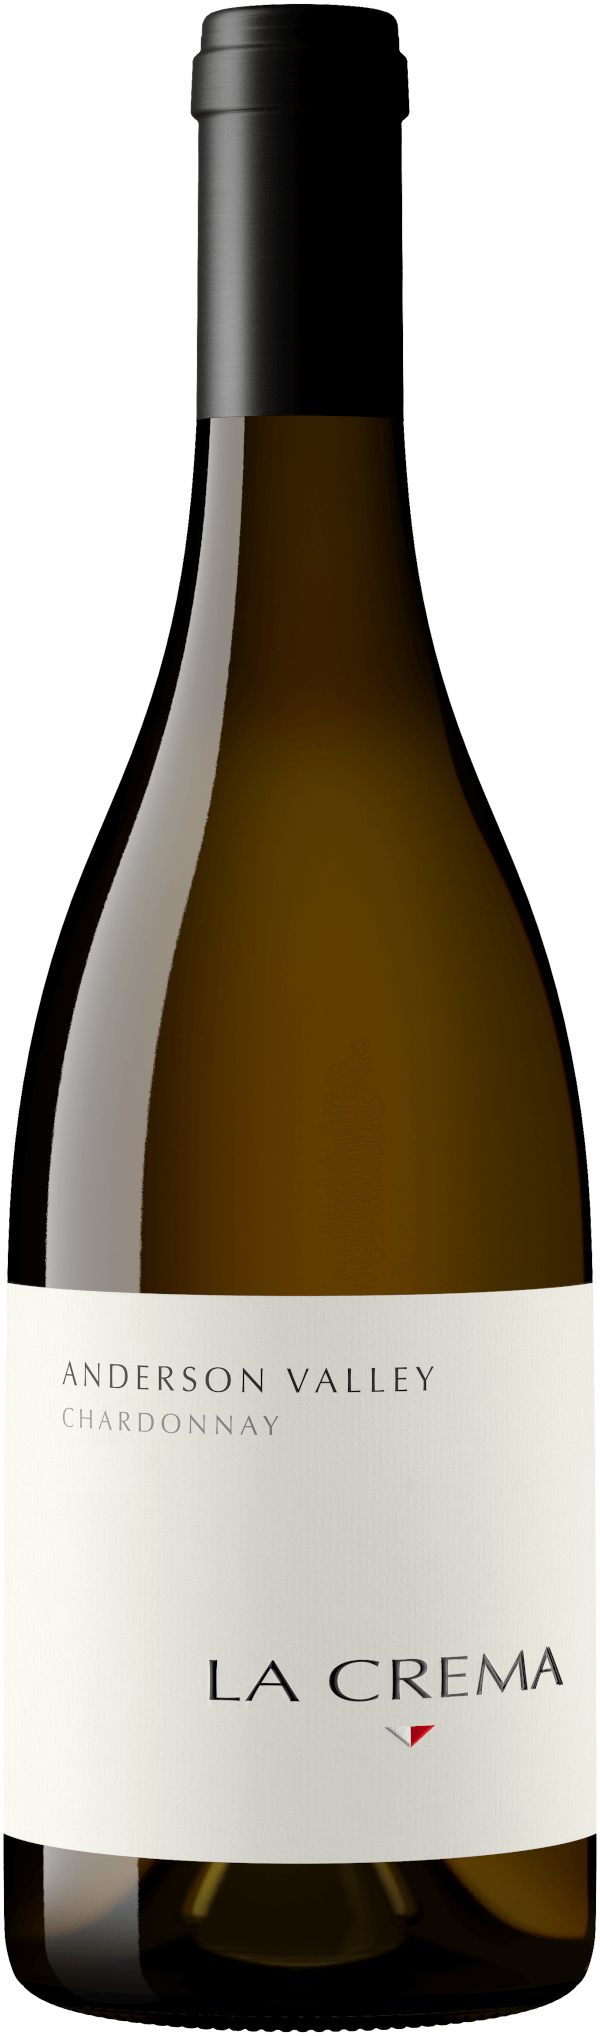 2019 Anderson Valley Chardonnay